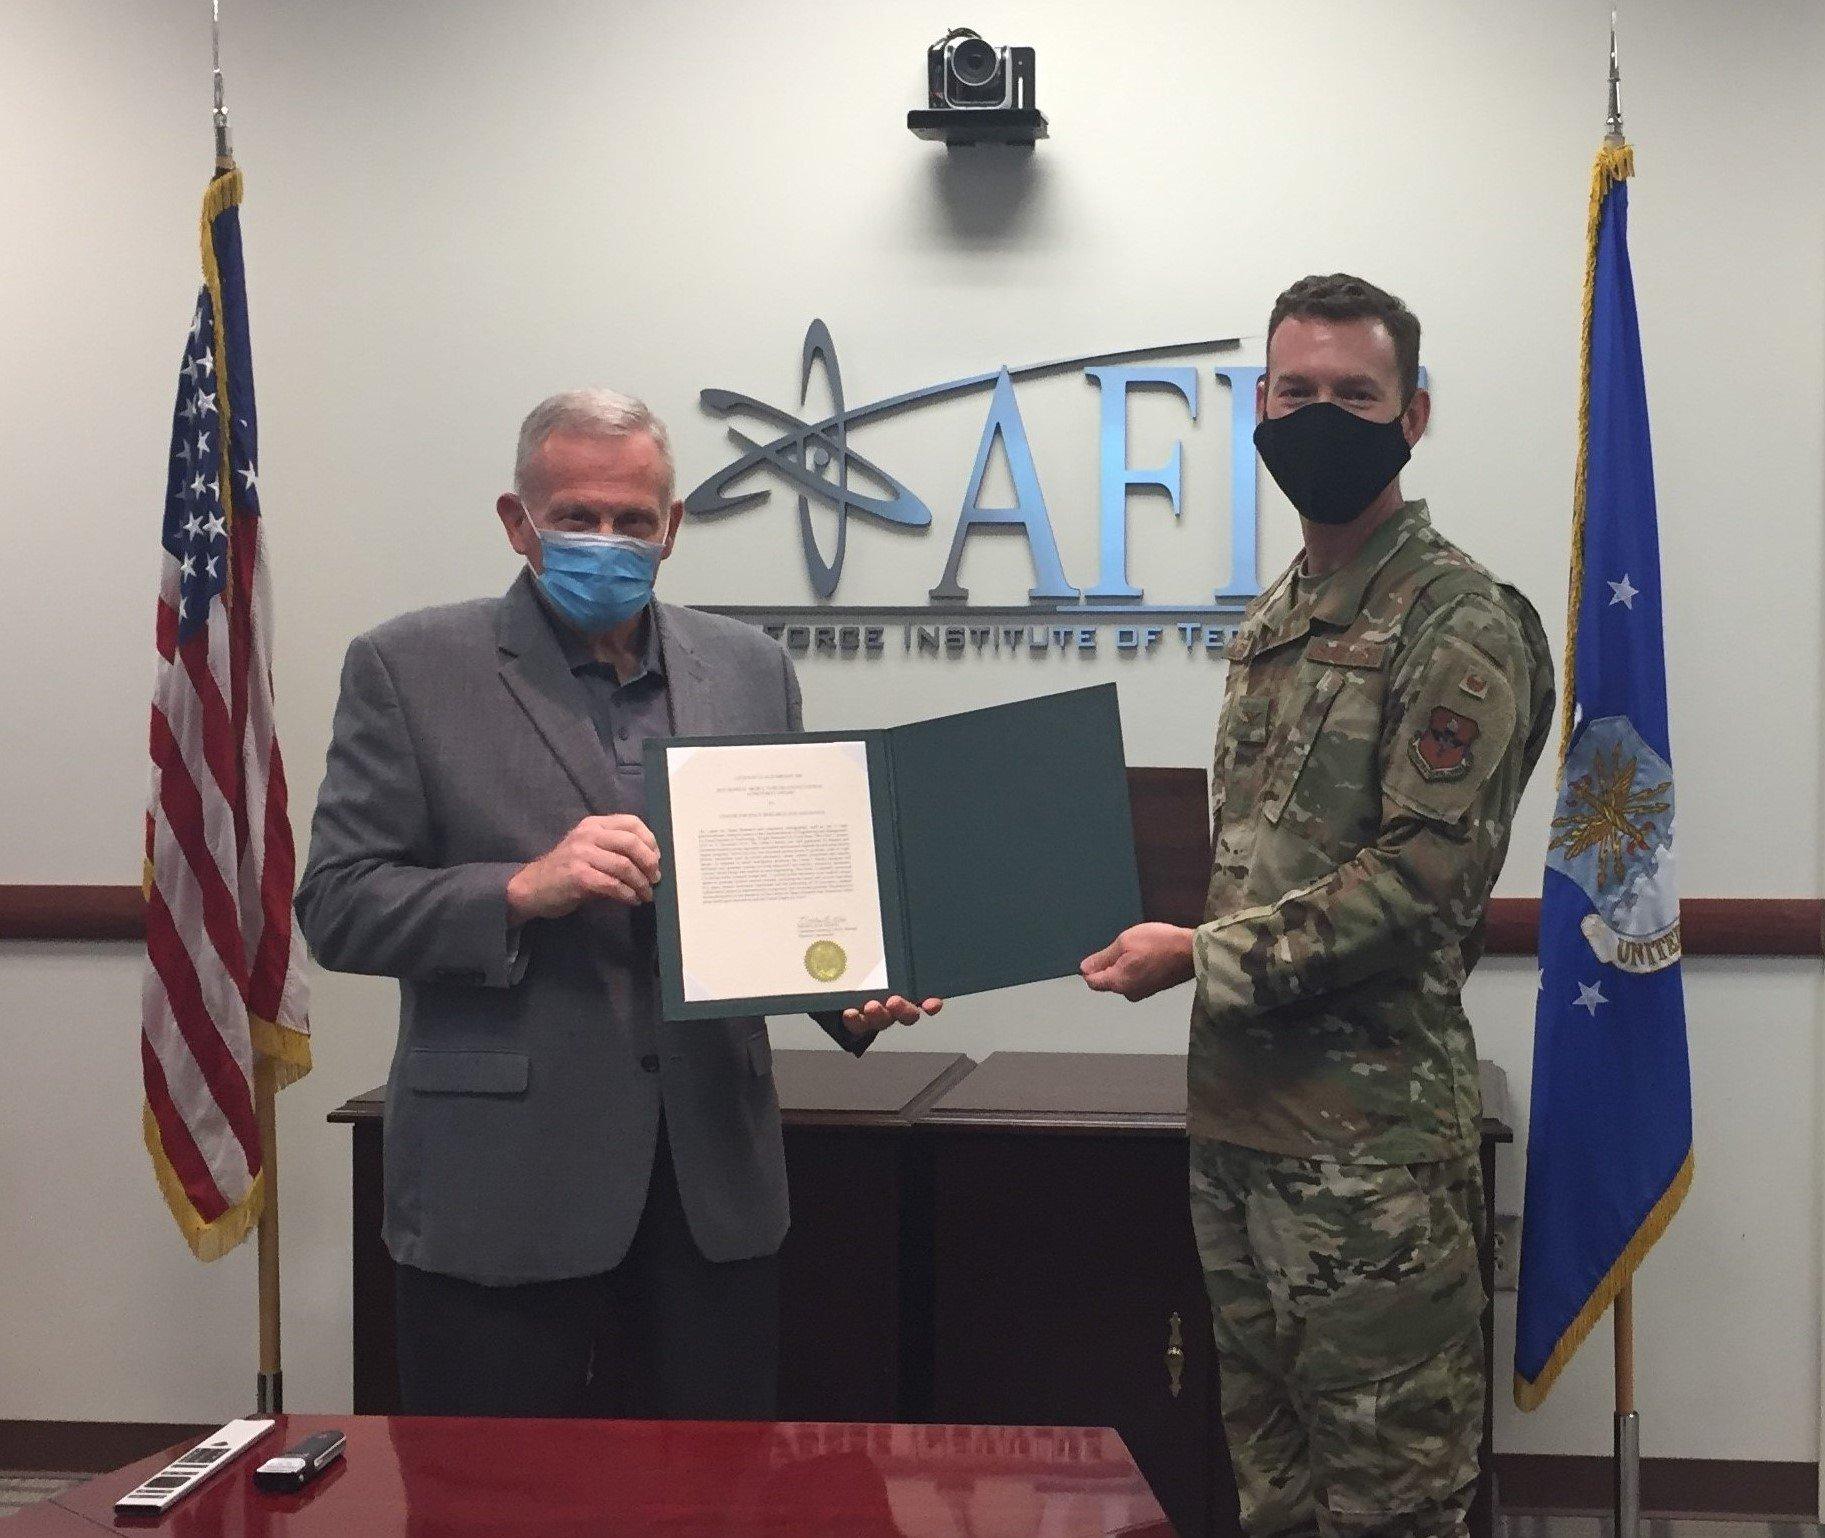 General Muir S. Fairchild – Educational Achievement Award